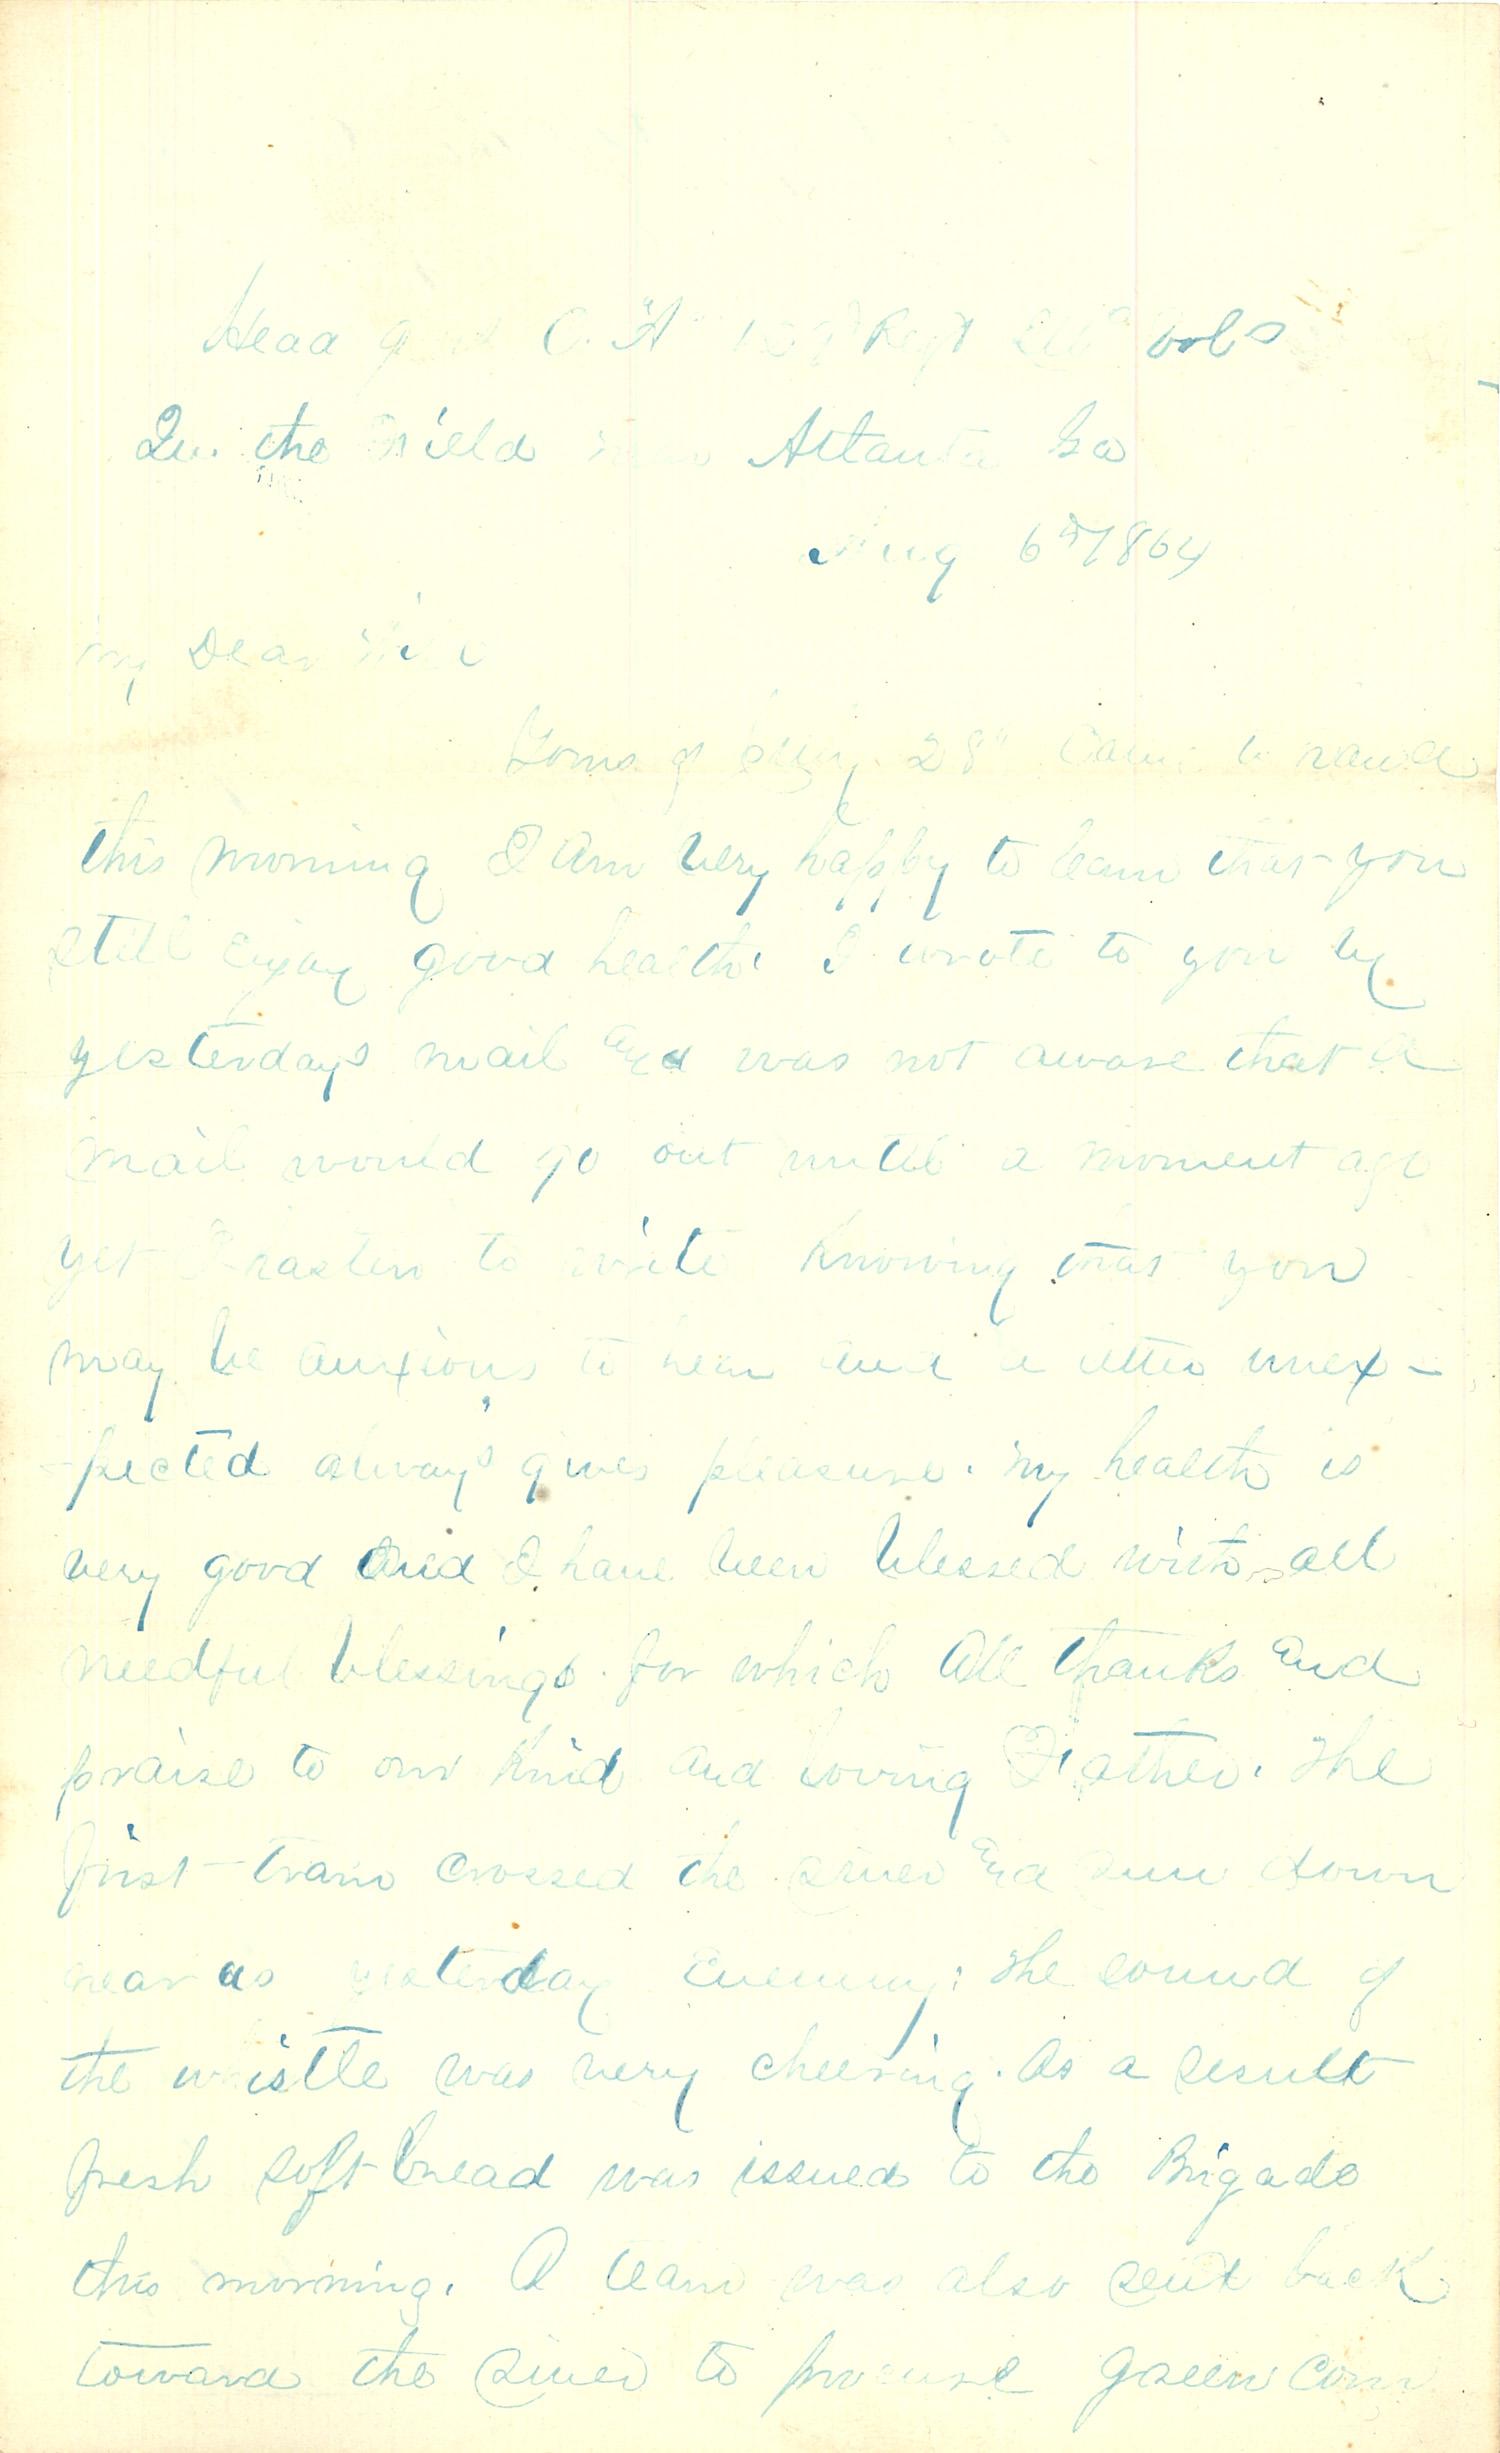 Joseph Culver Letter, August 6, 1864, Page 1